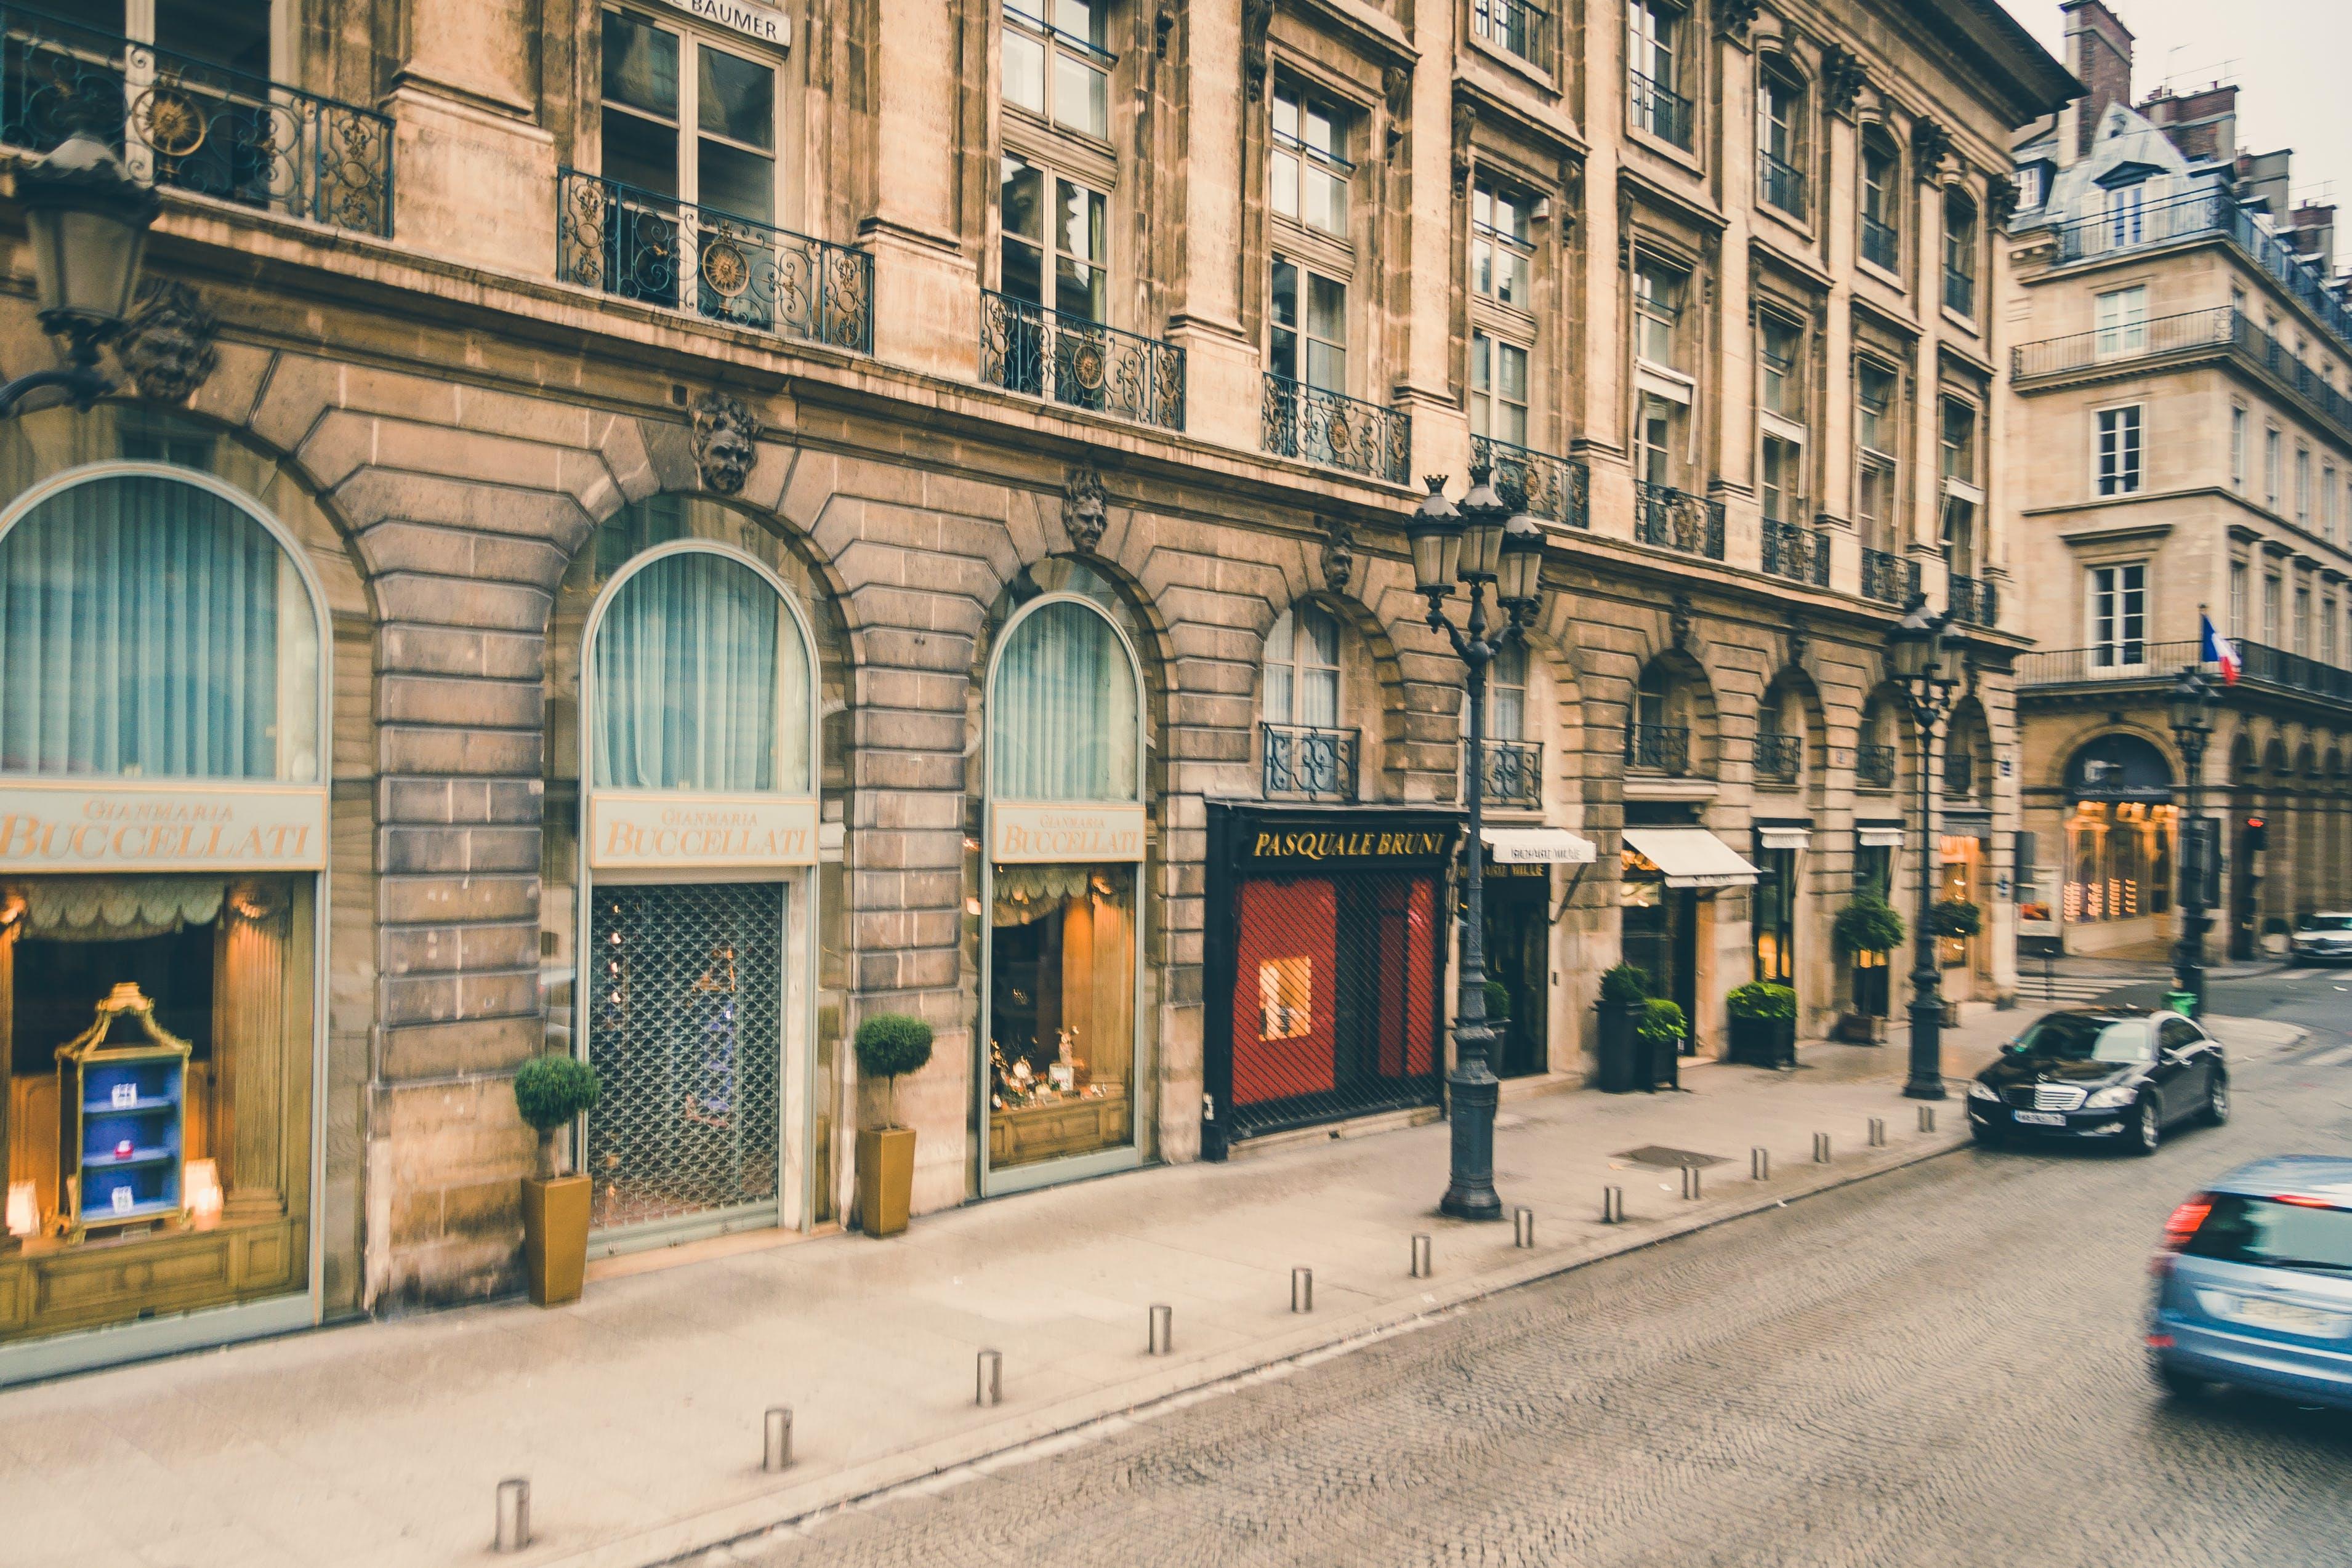 buildings, cars, city